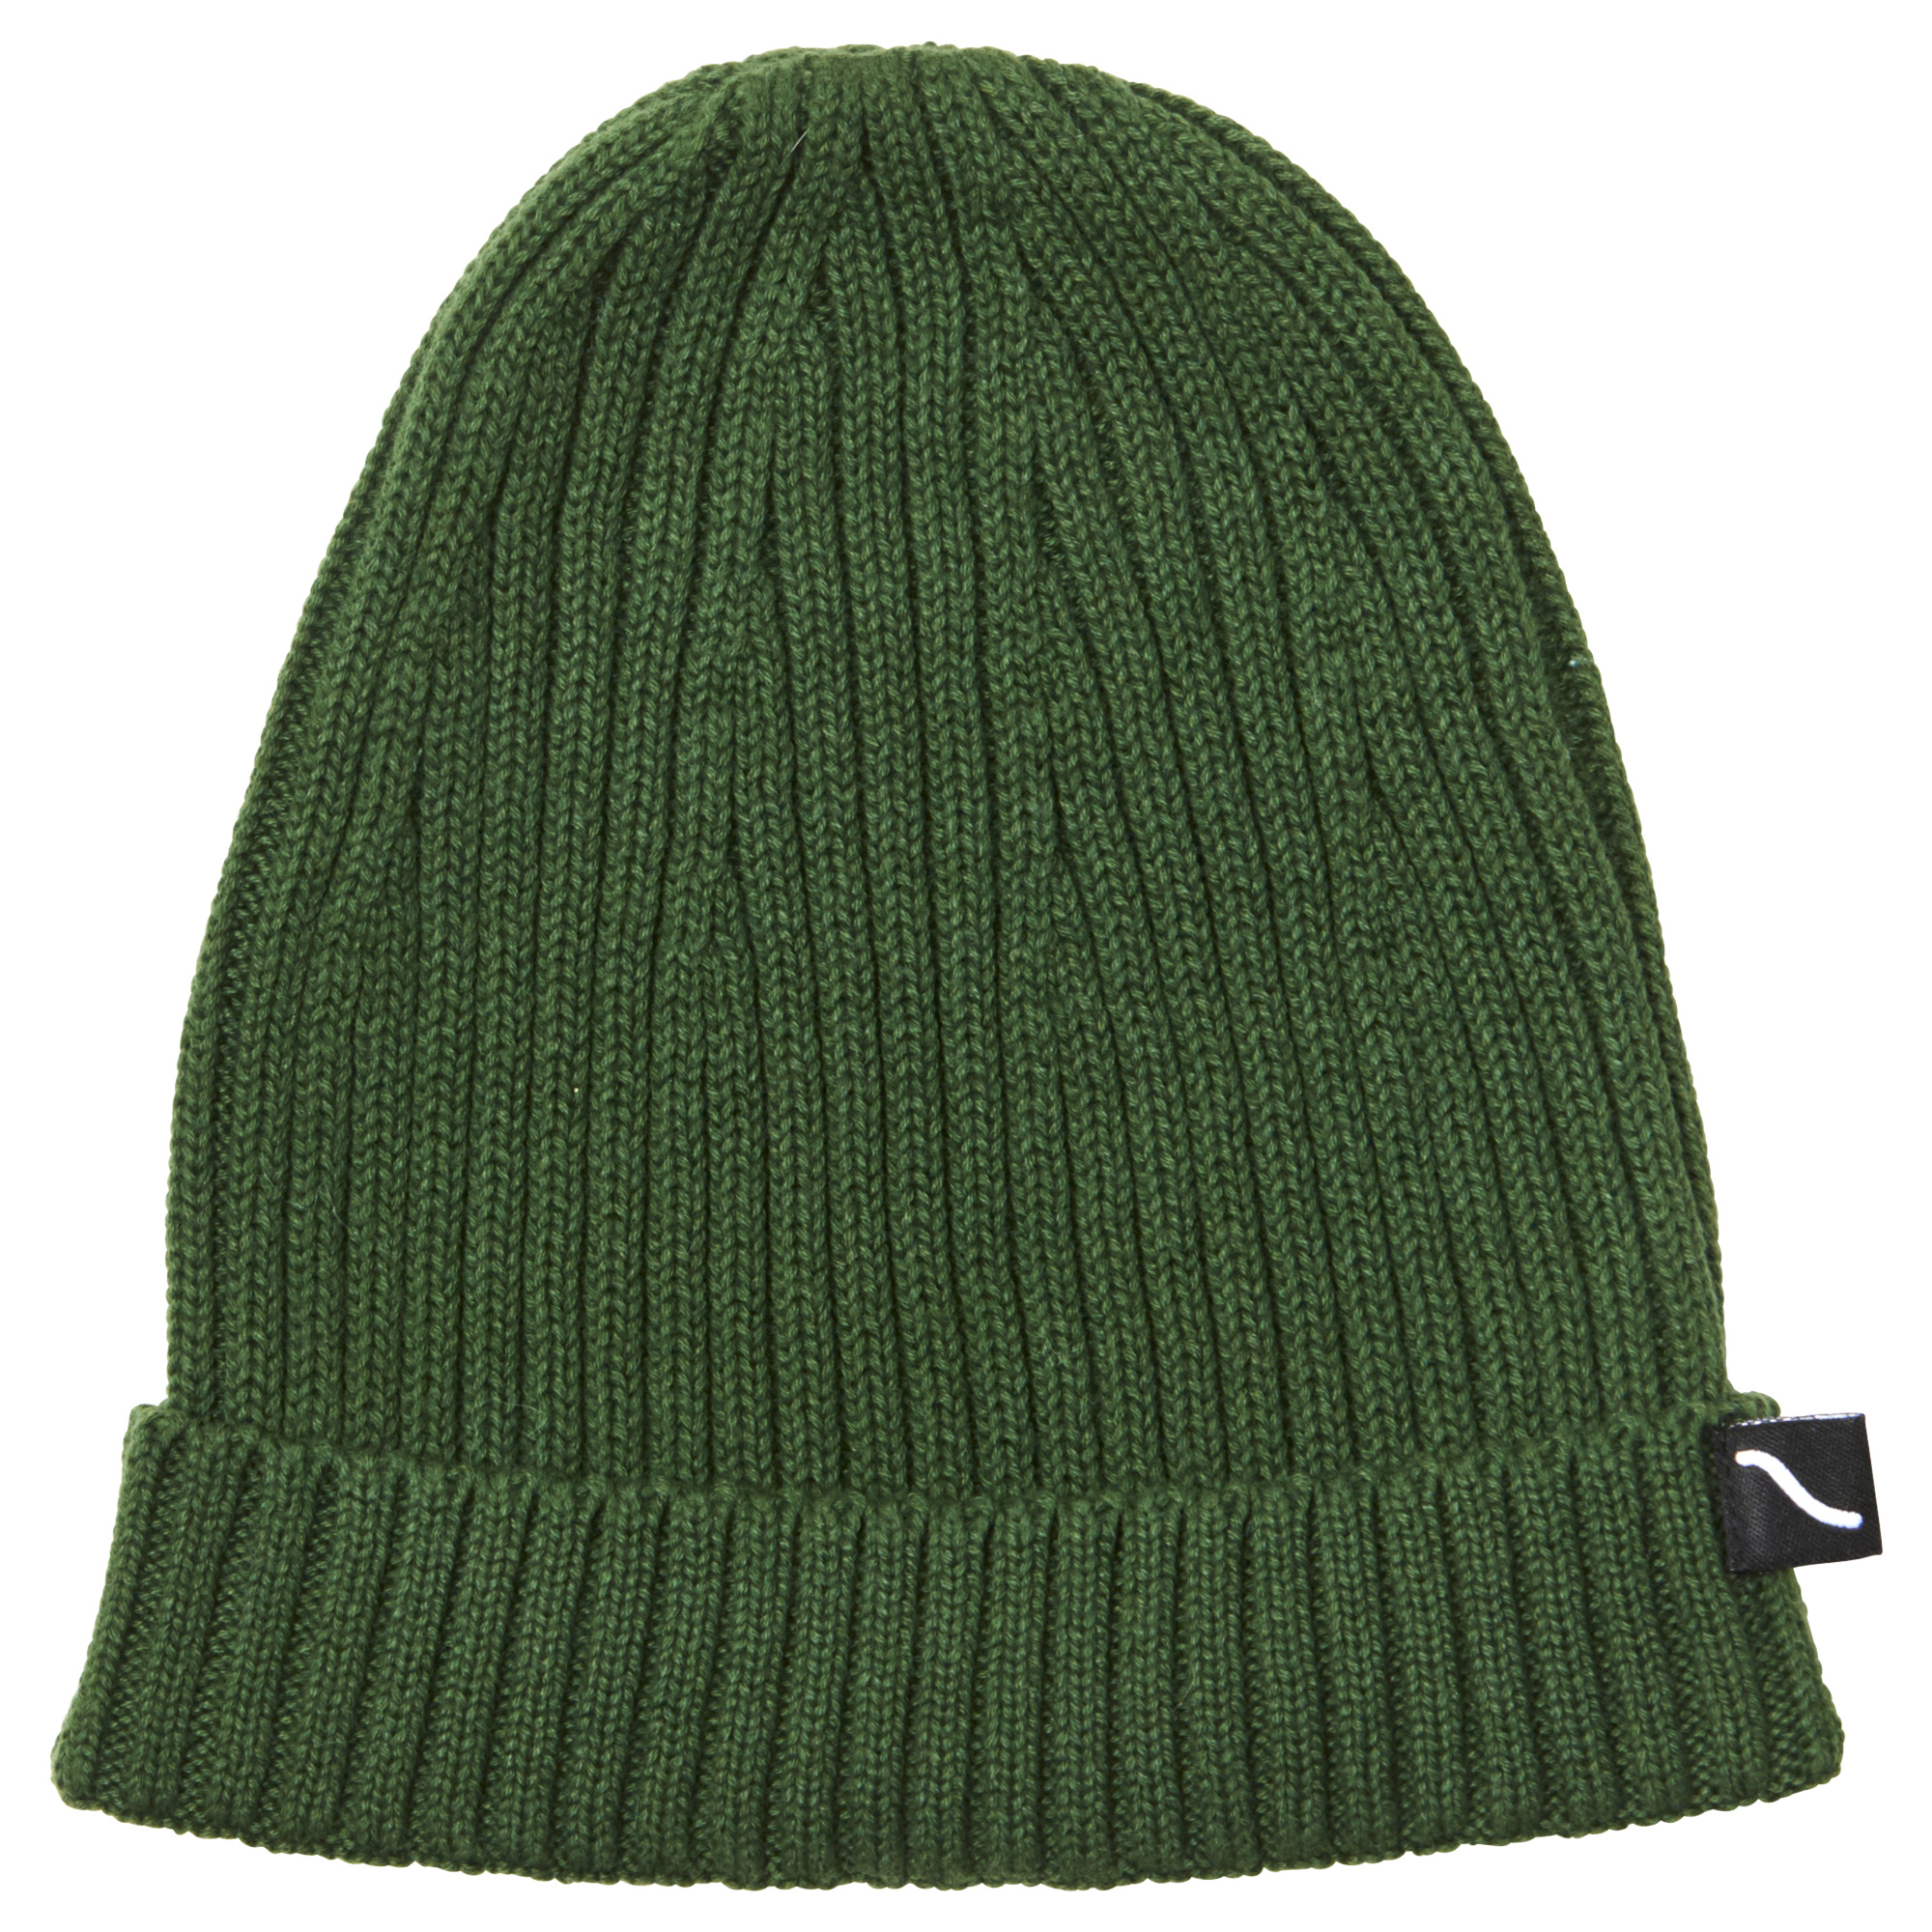 CarlijnQ Knit basics beanie green